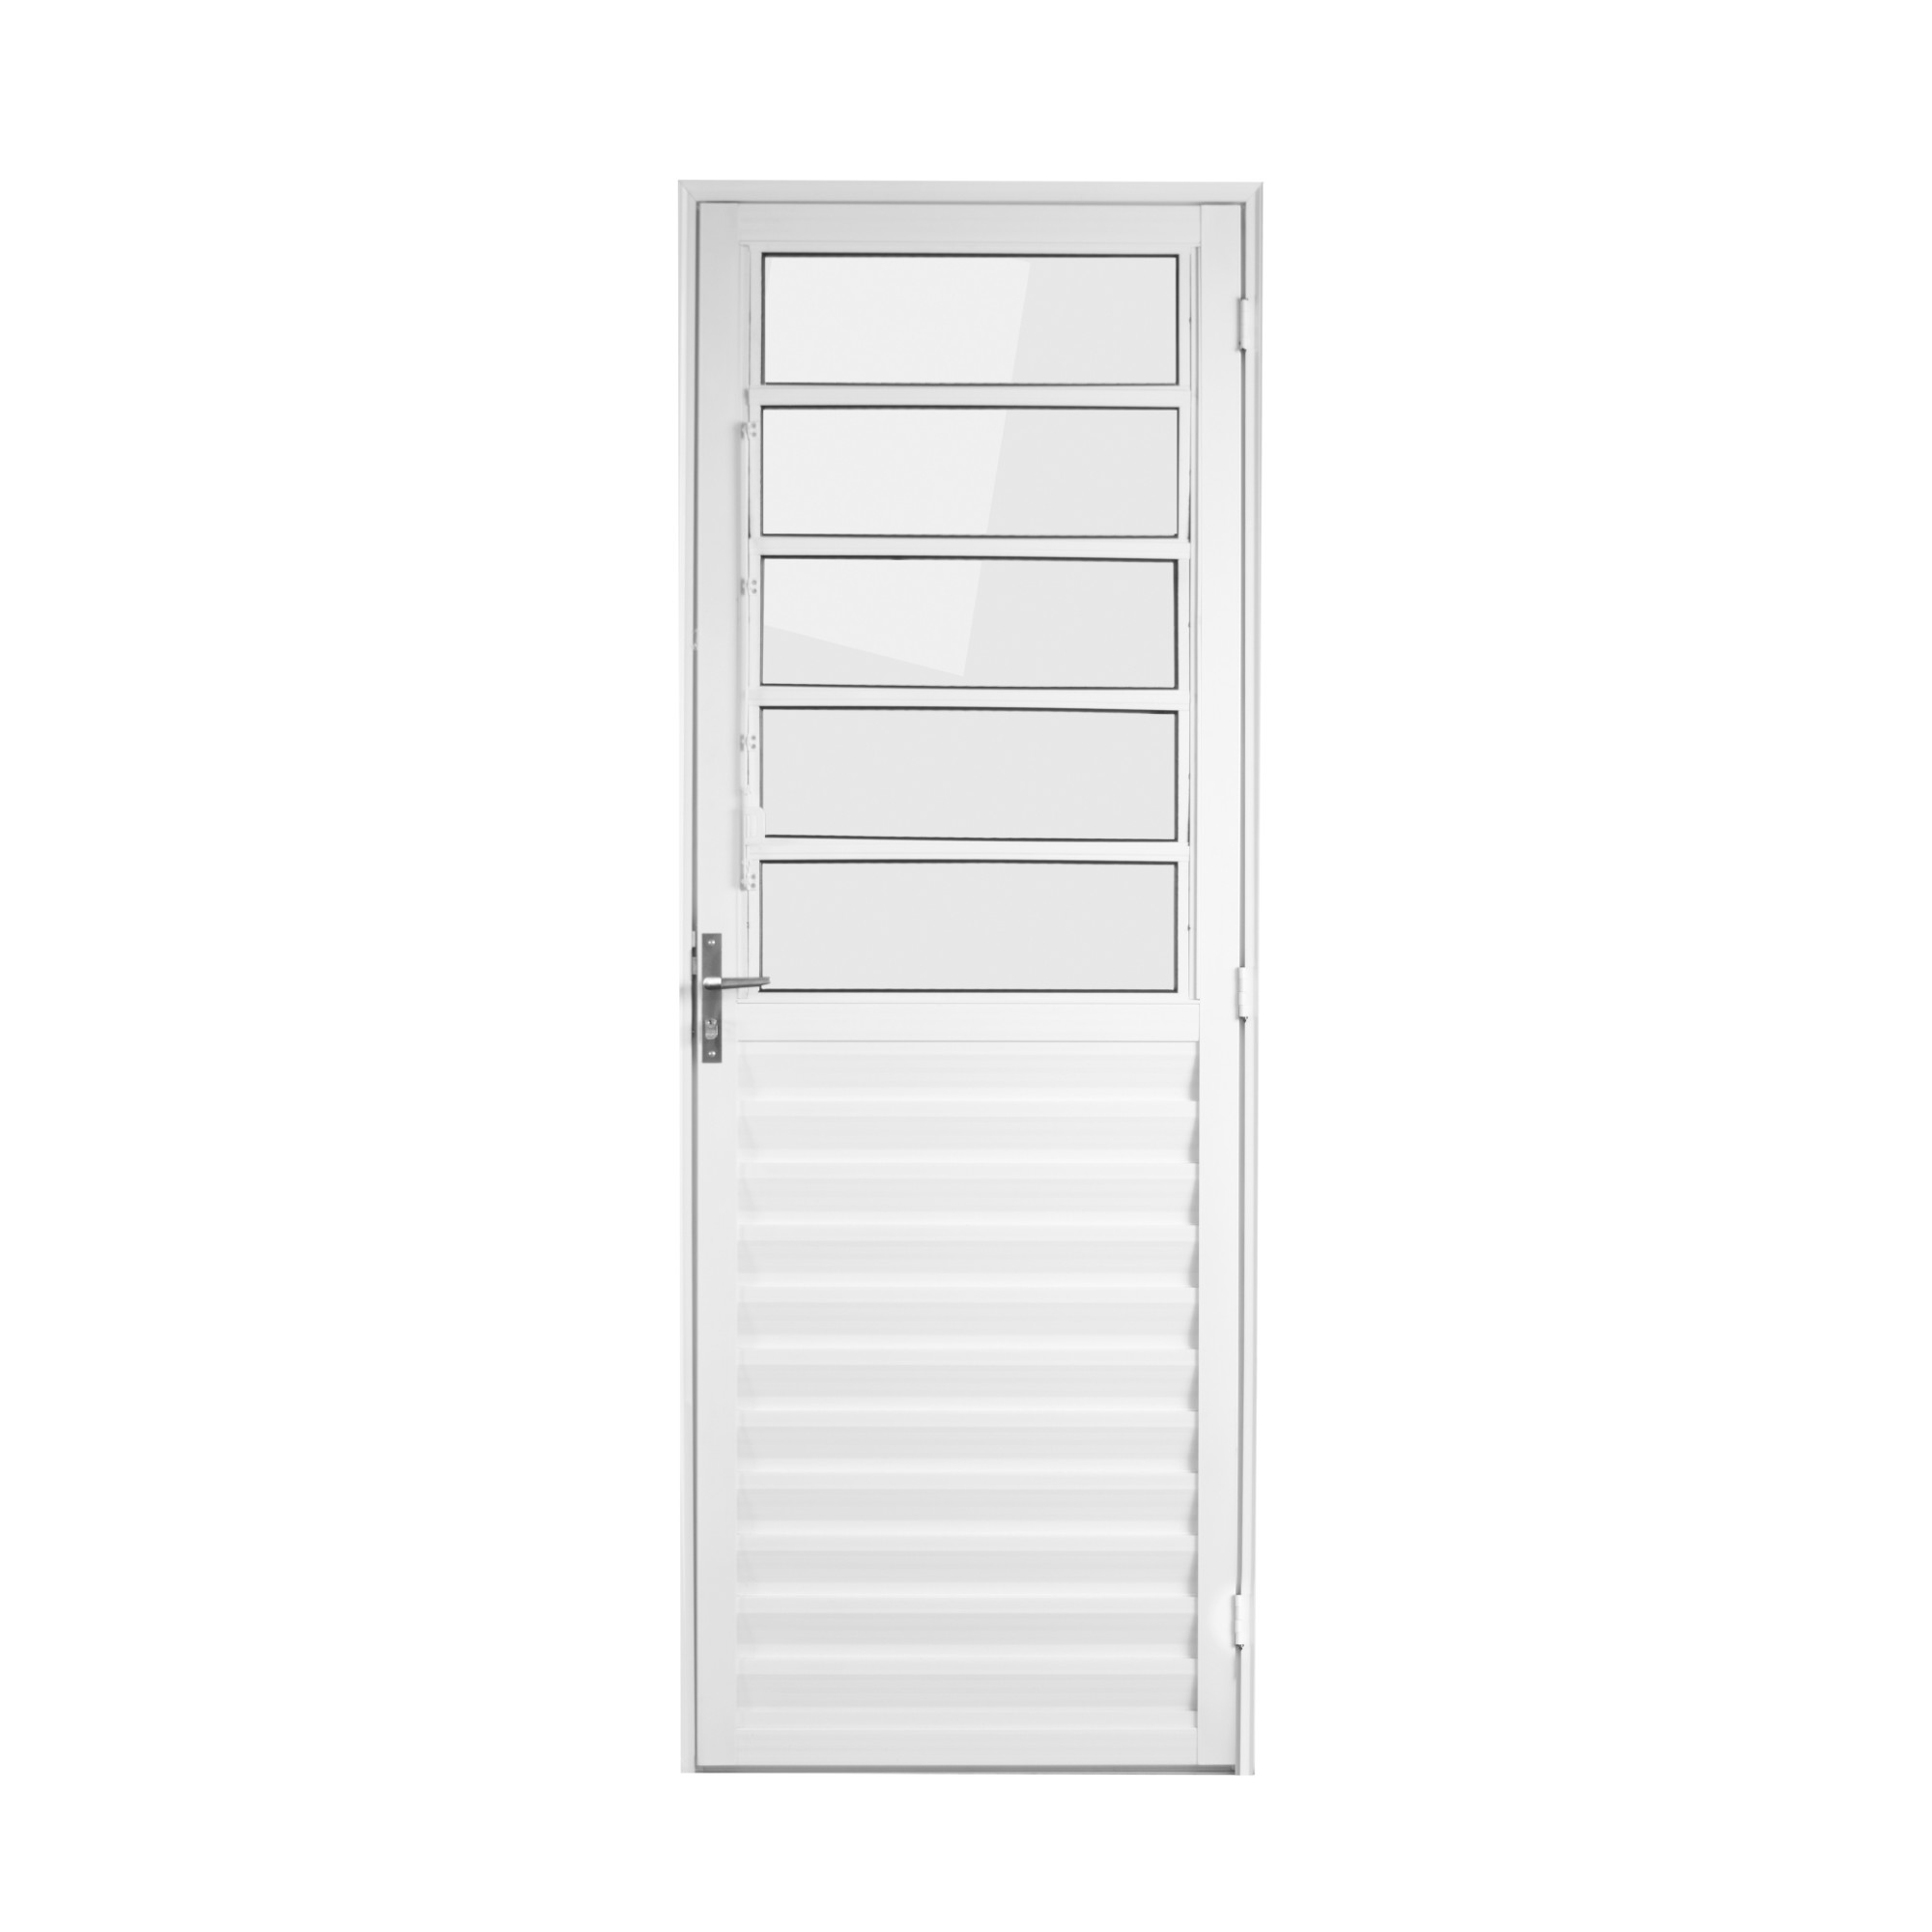 Porta de Aluminio Basculante Branca 210x80 cm Lado Esquerdo Vidro Liso - Aluvid